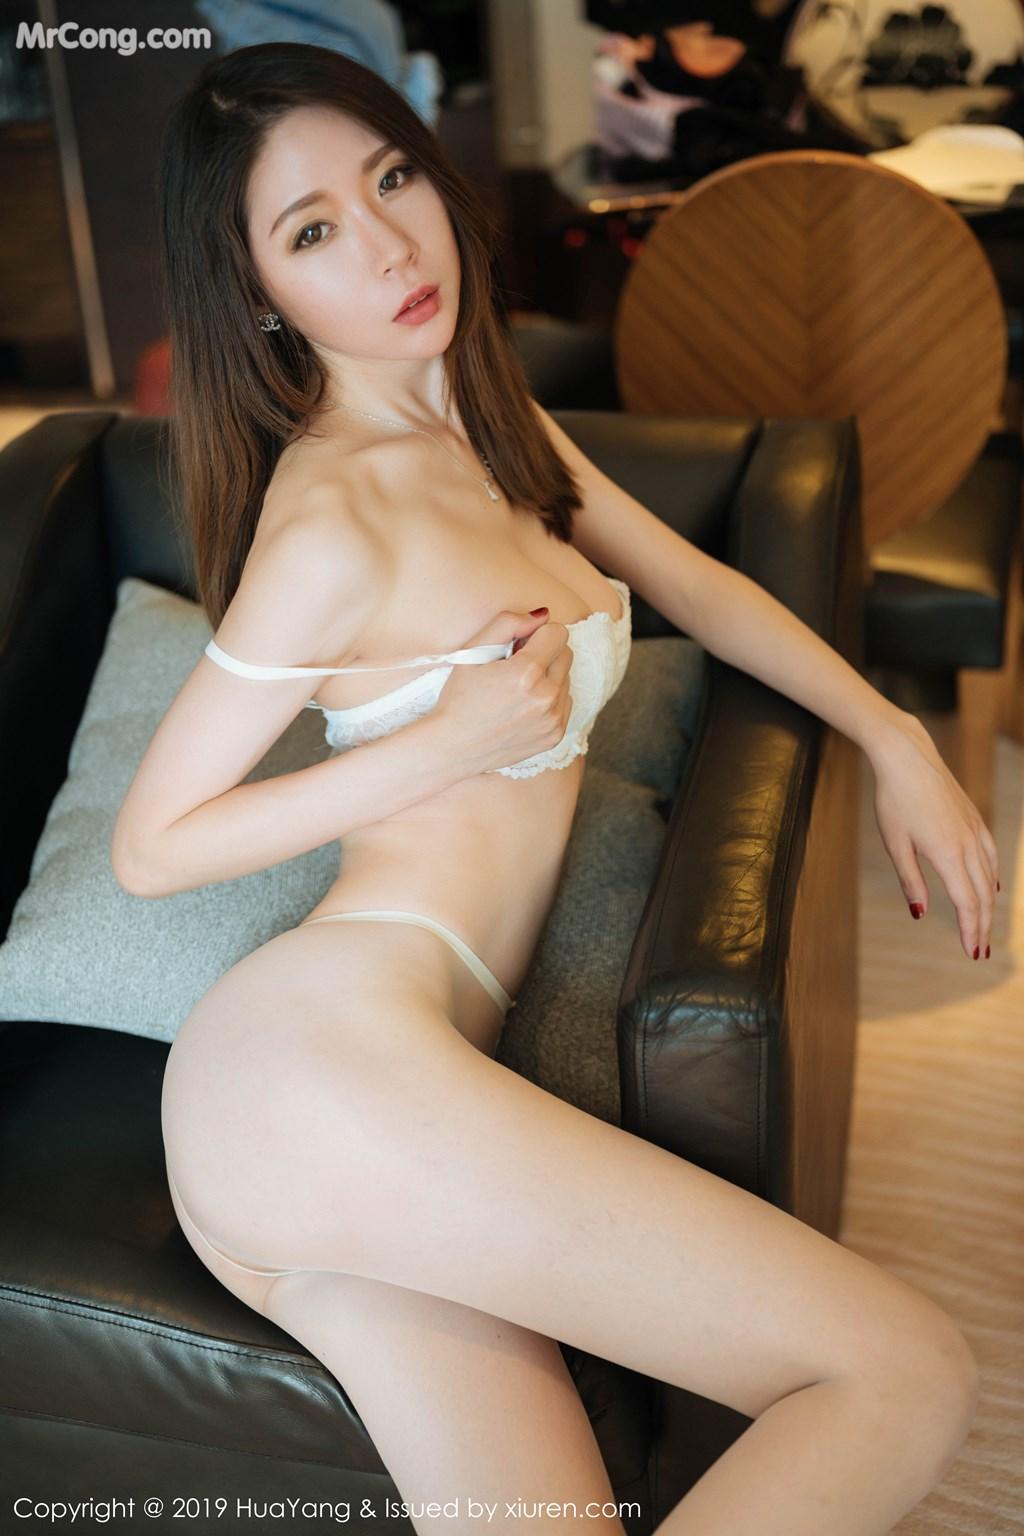 Image HuaYang-Vol.170-Meng-Xin-Yue-MrCong.com-052 in post HuaYang Vol.170: Meng Xin Yue (梦心月) (61 ảnh)